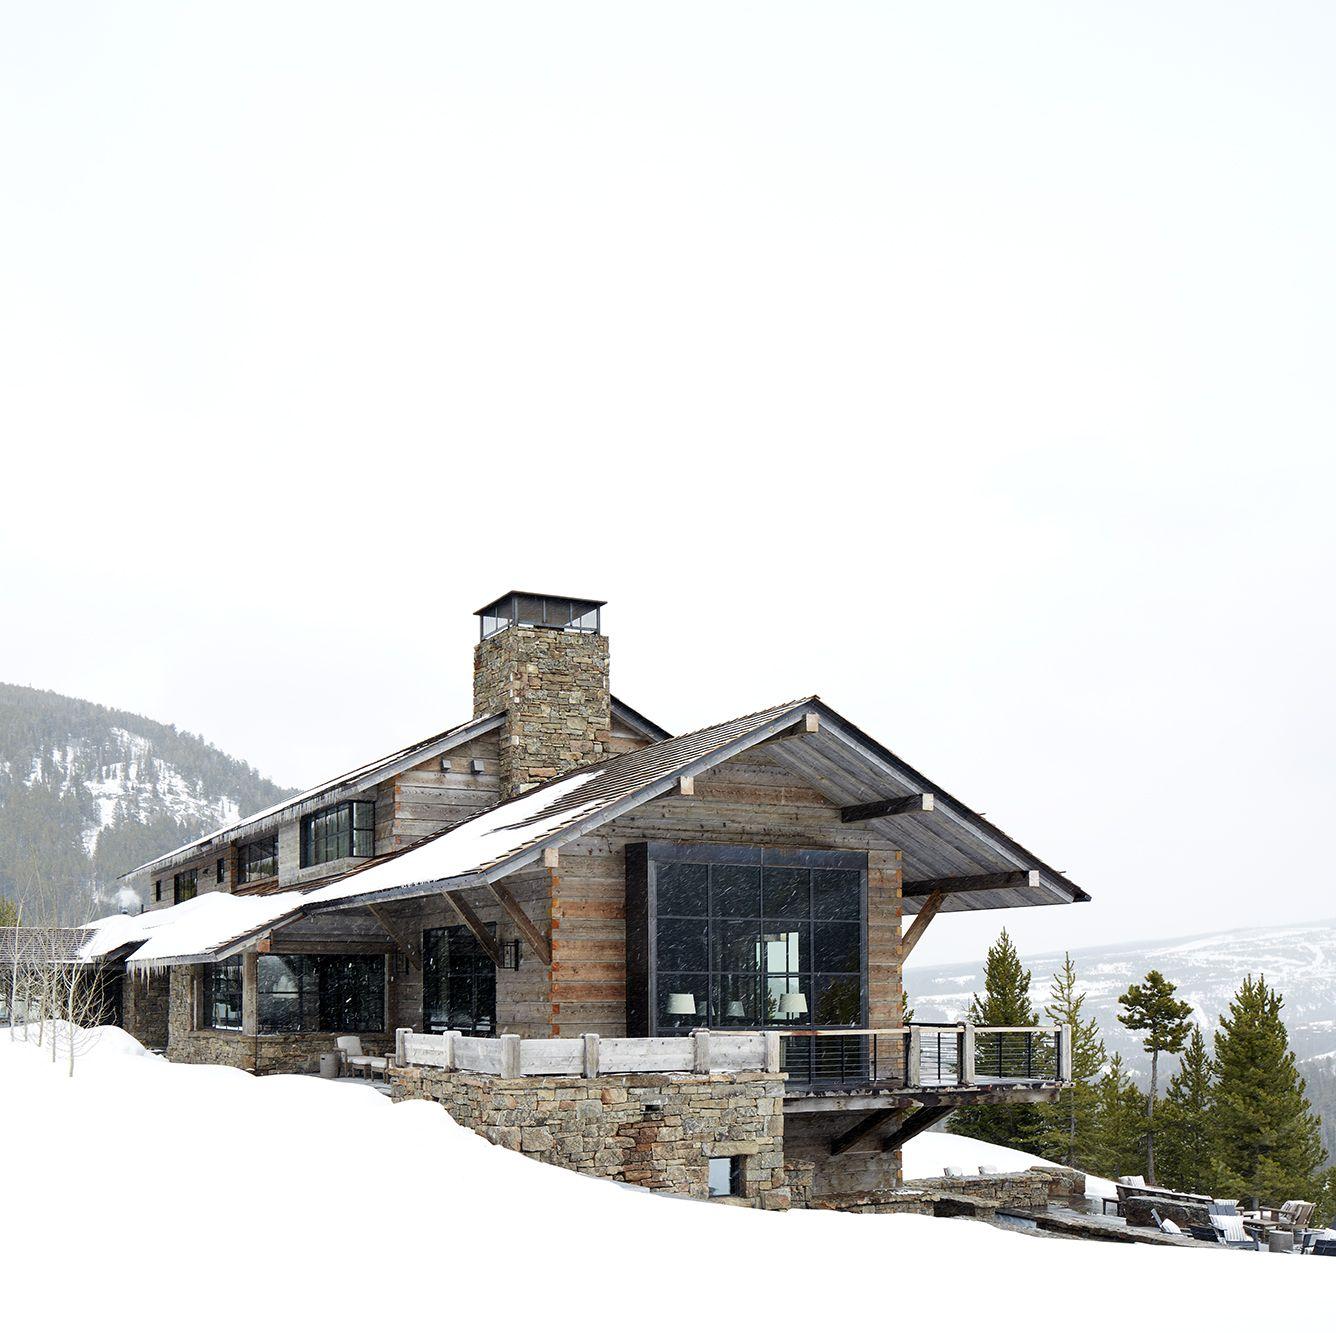 Montana ski chalet. Get the Look! Modern Rustic Interior Design in a Masculine Ski Chalet